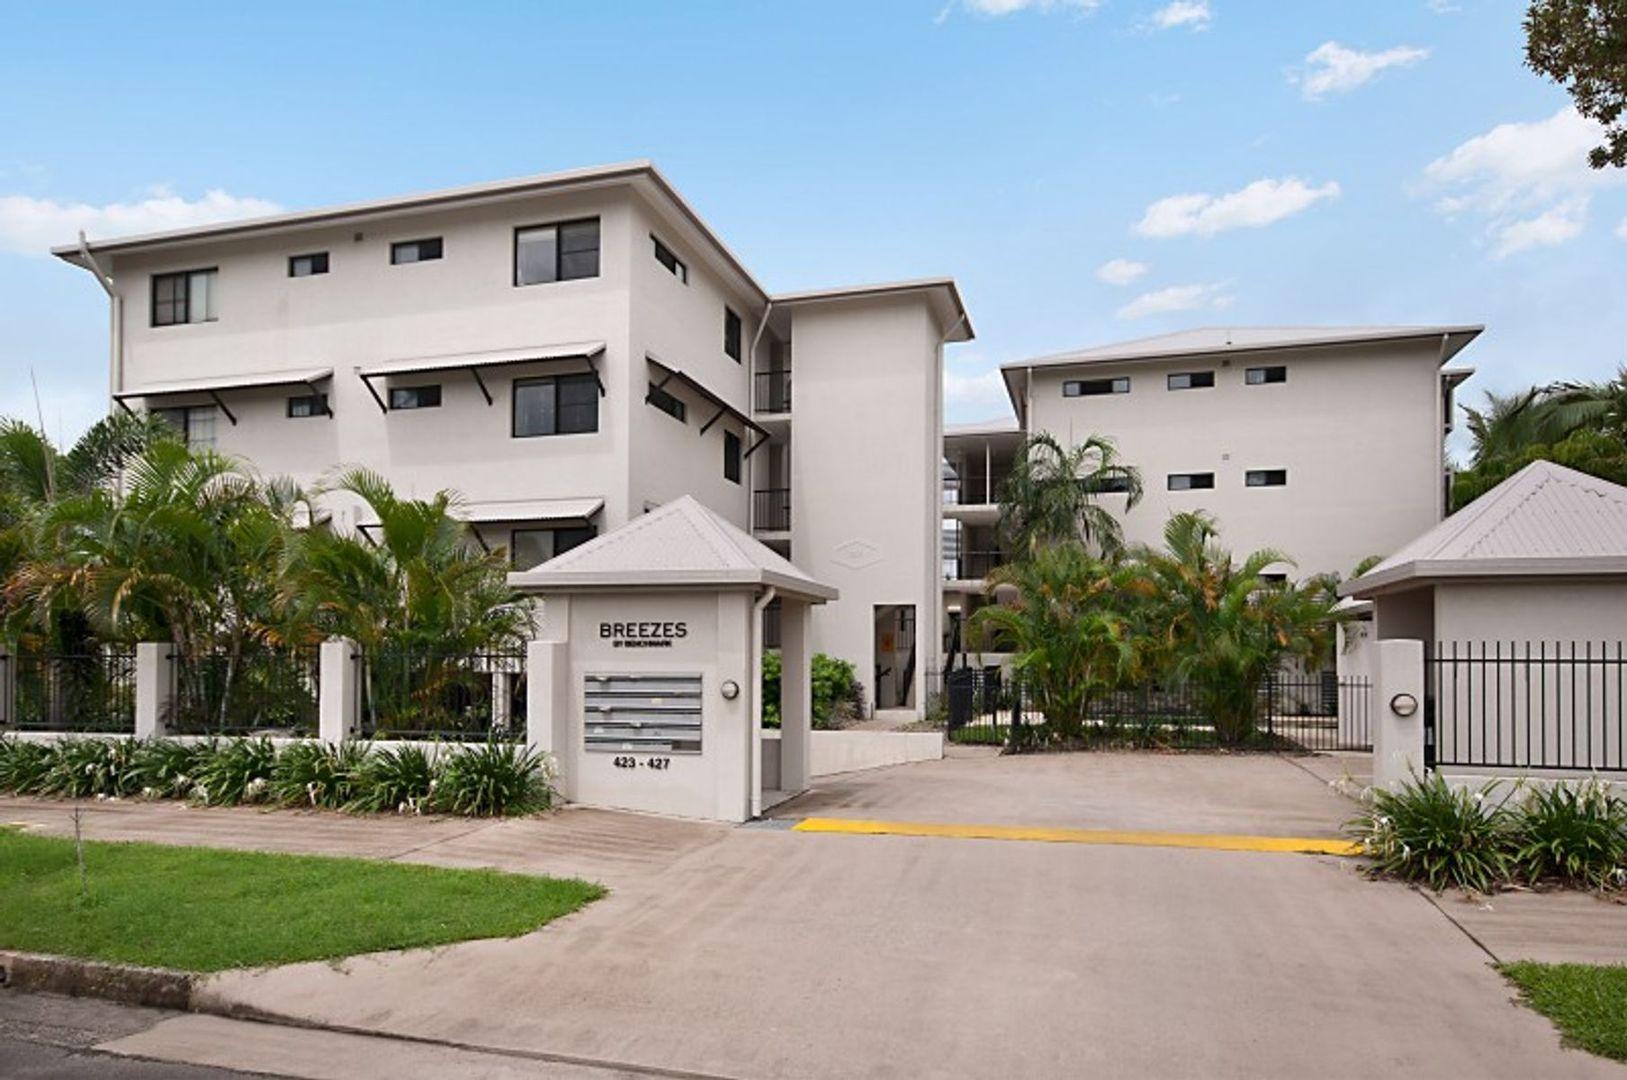 16/423-427 Draper Street, Parramatta Park QLD 4870, Image 0